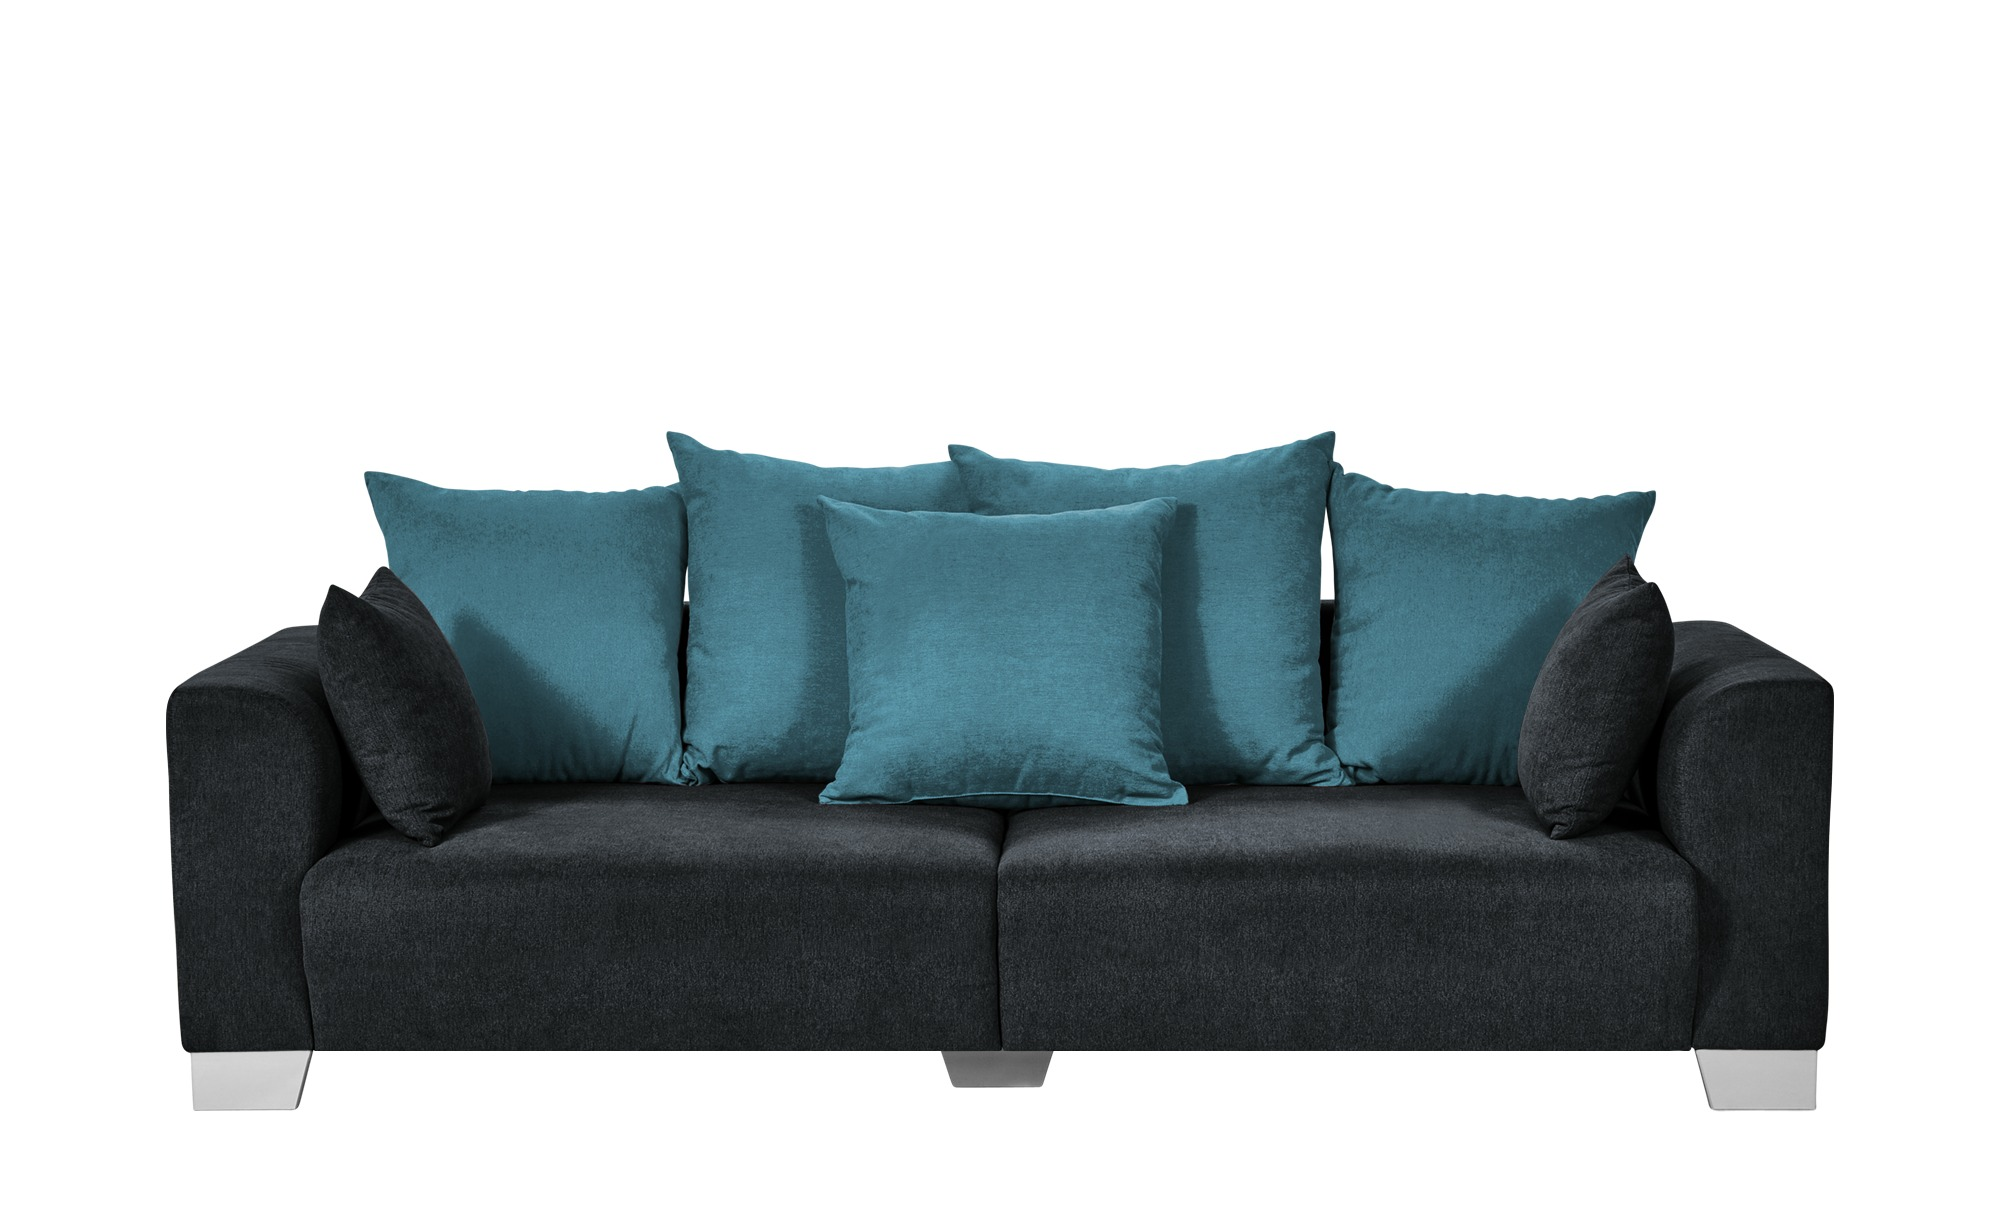 smart Big Sofa schwarz - Flachgewebe Tonja ¦ schwarz ¦ Maße (cm): B: 244 H: 68 T: 107 Polstermöbel > Sofas > Big-Sofas - Höffner